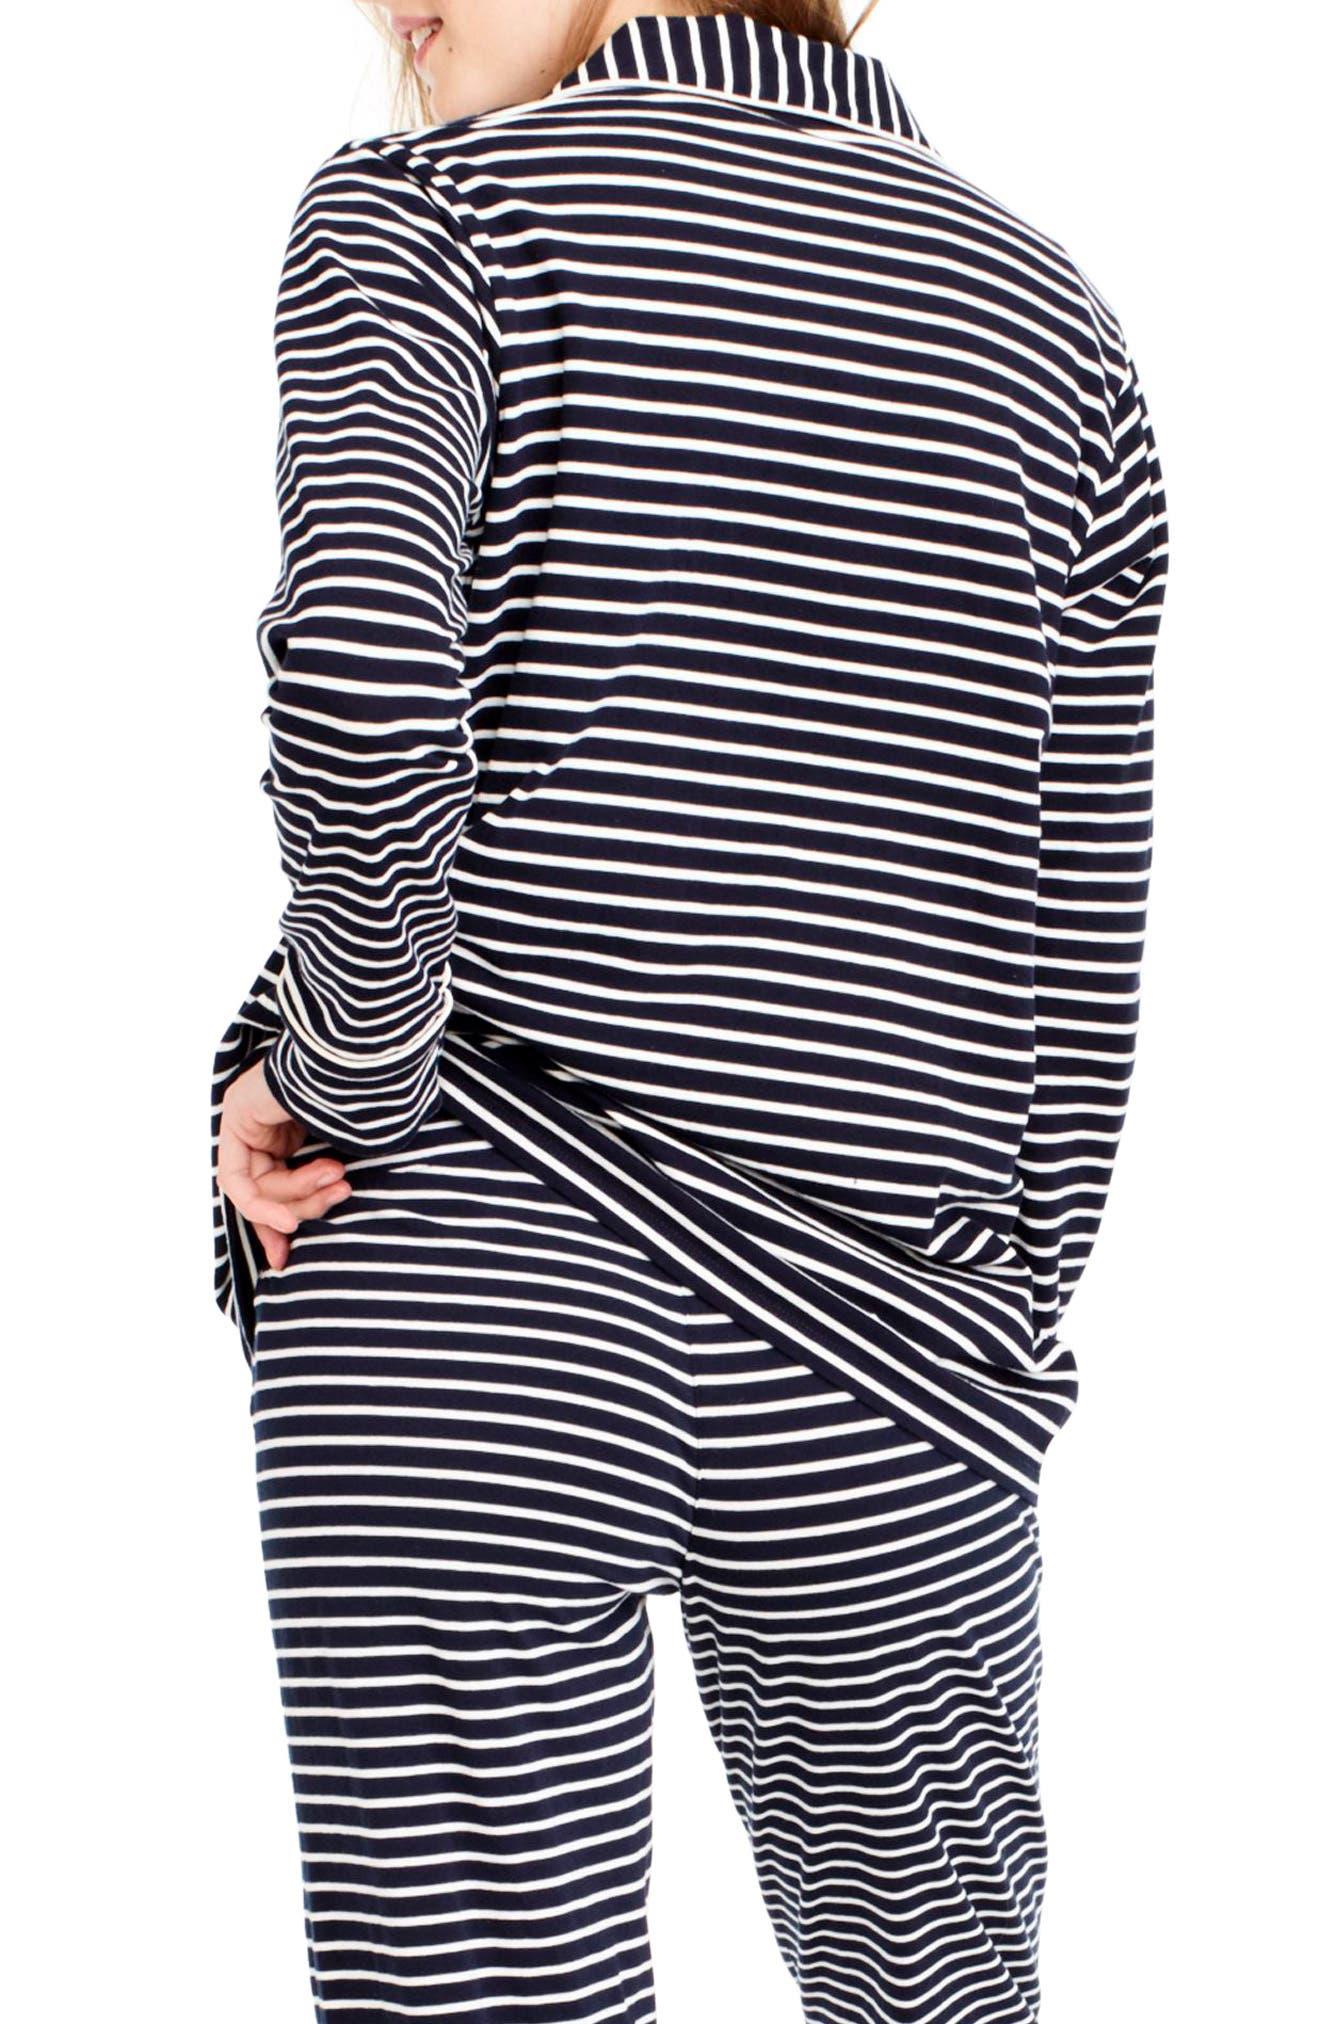 Dreamy Stripe Cotton Pajamas,                             Alternate thumbnail 2, color,                             NAVY IVORY